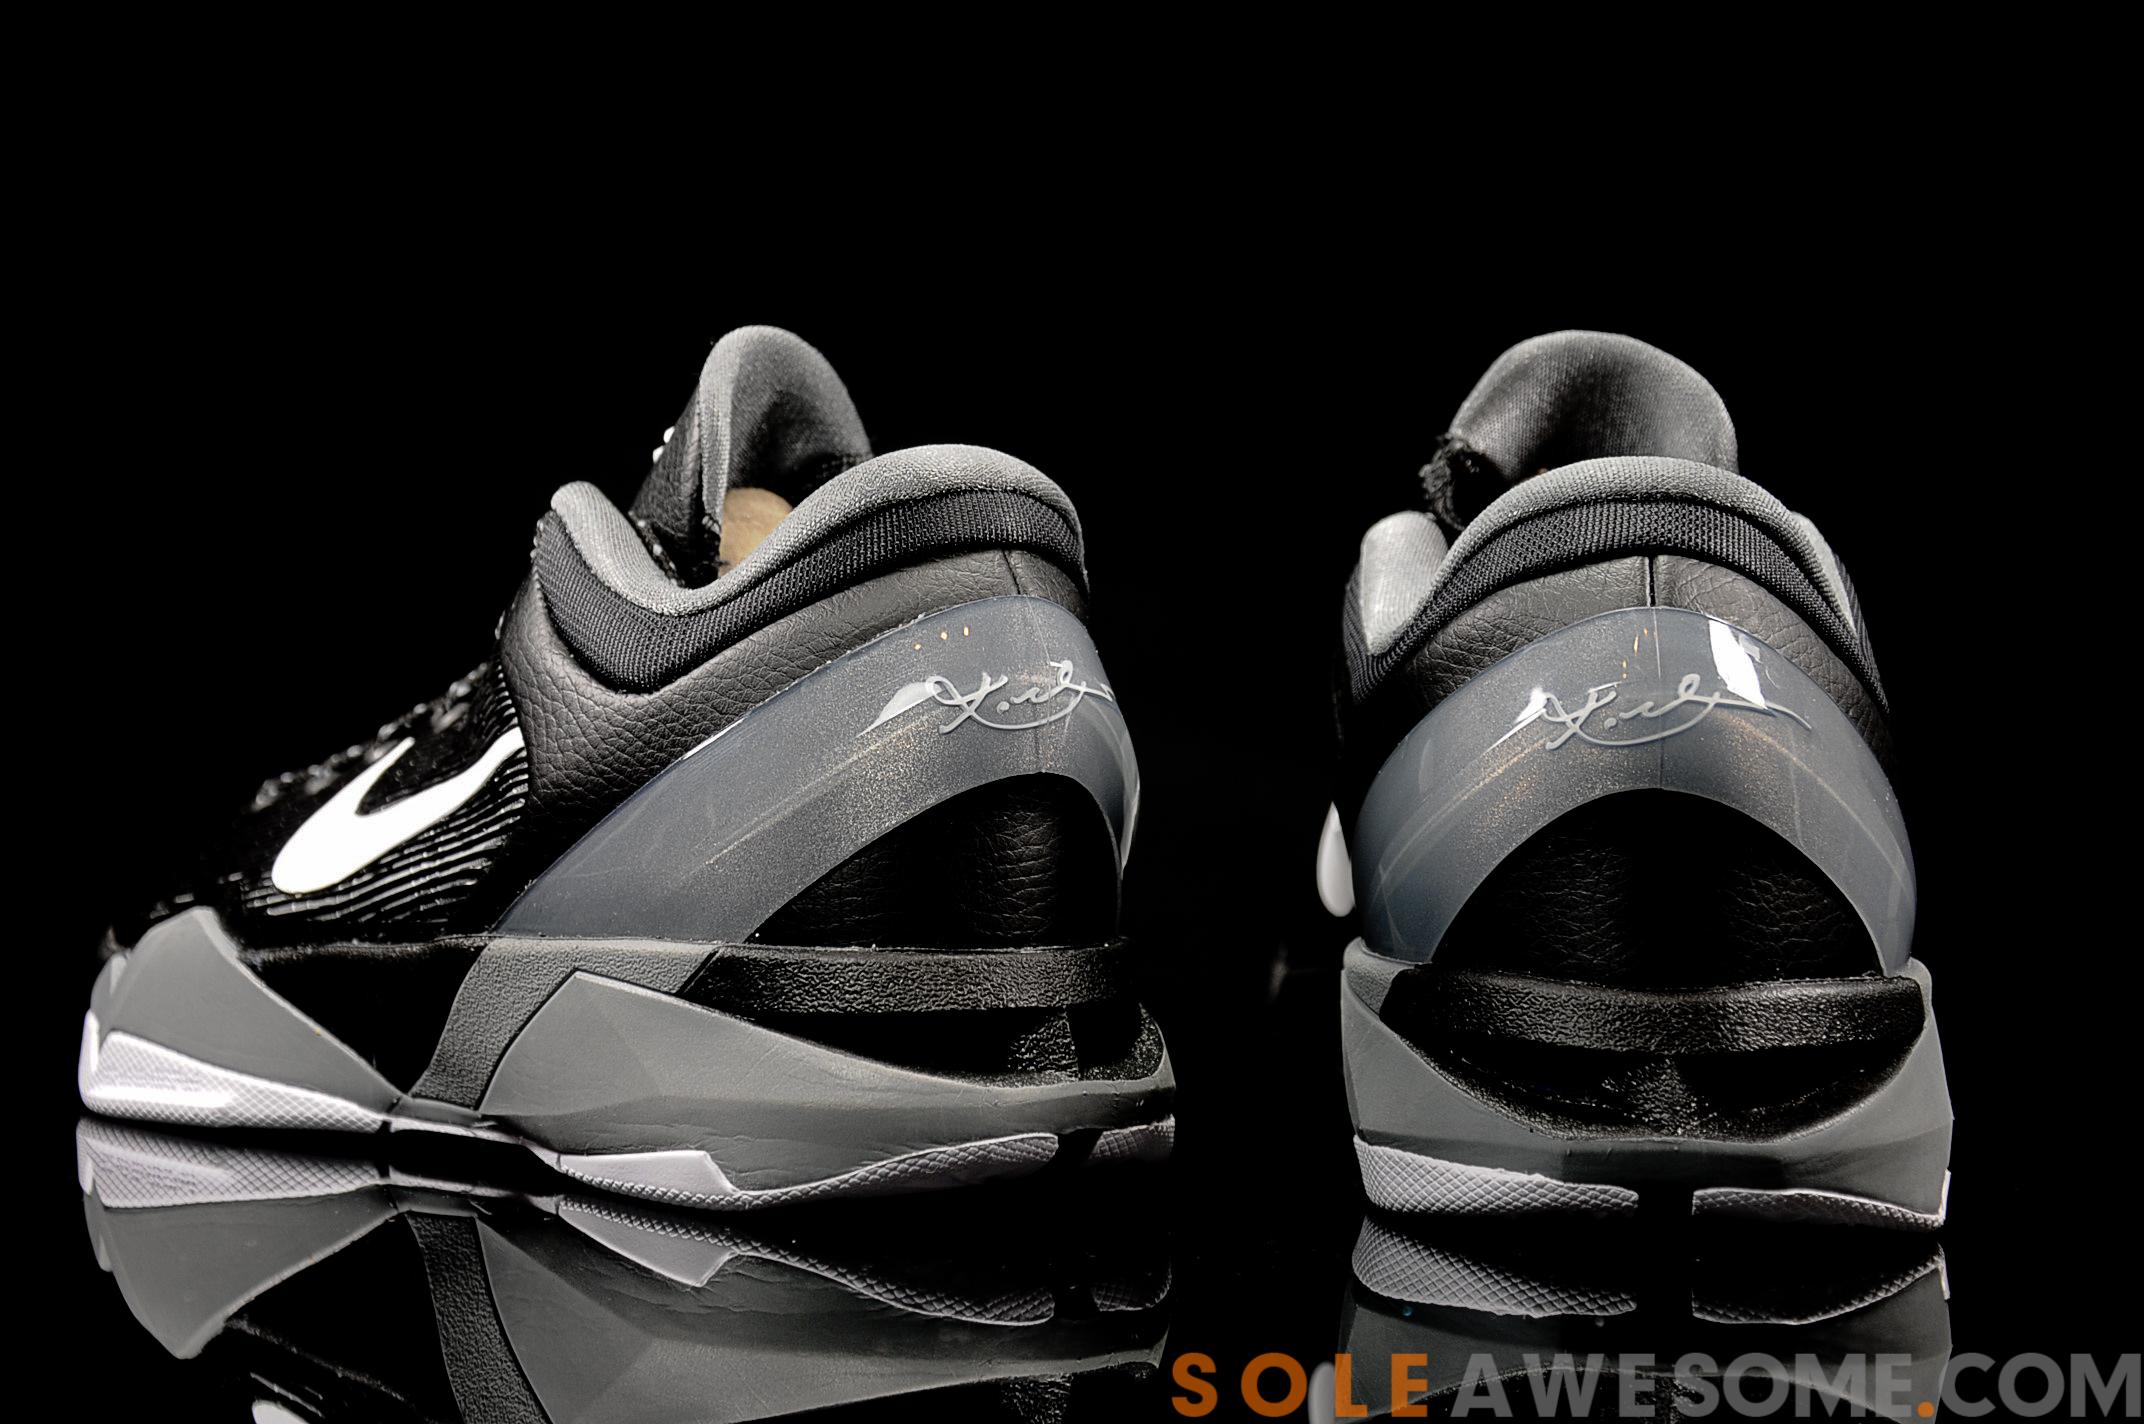 Nike Zoom Kobe 7 VII Black Red White